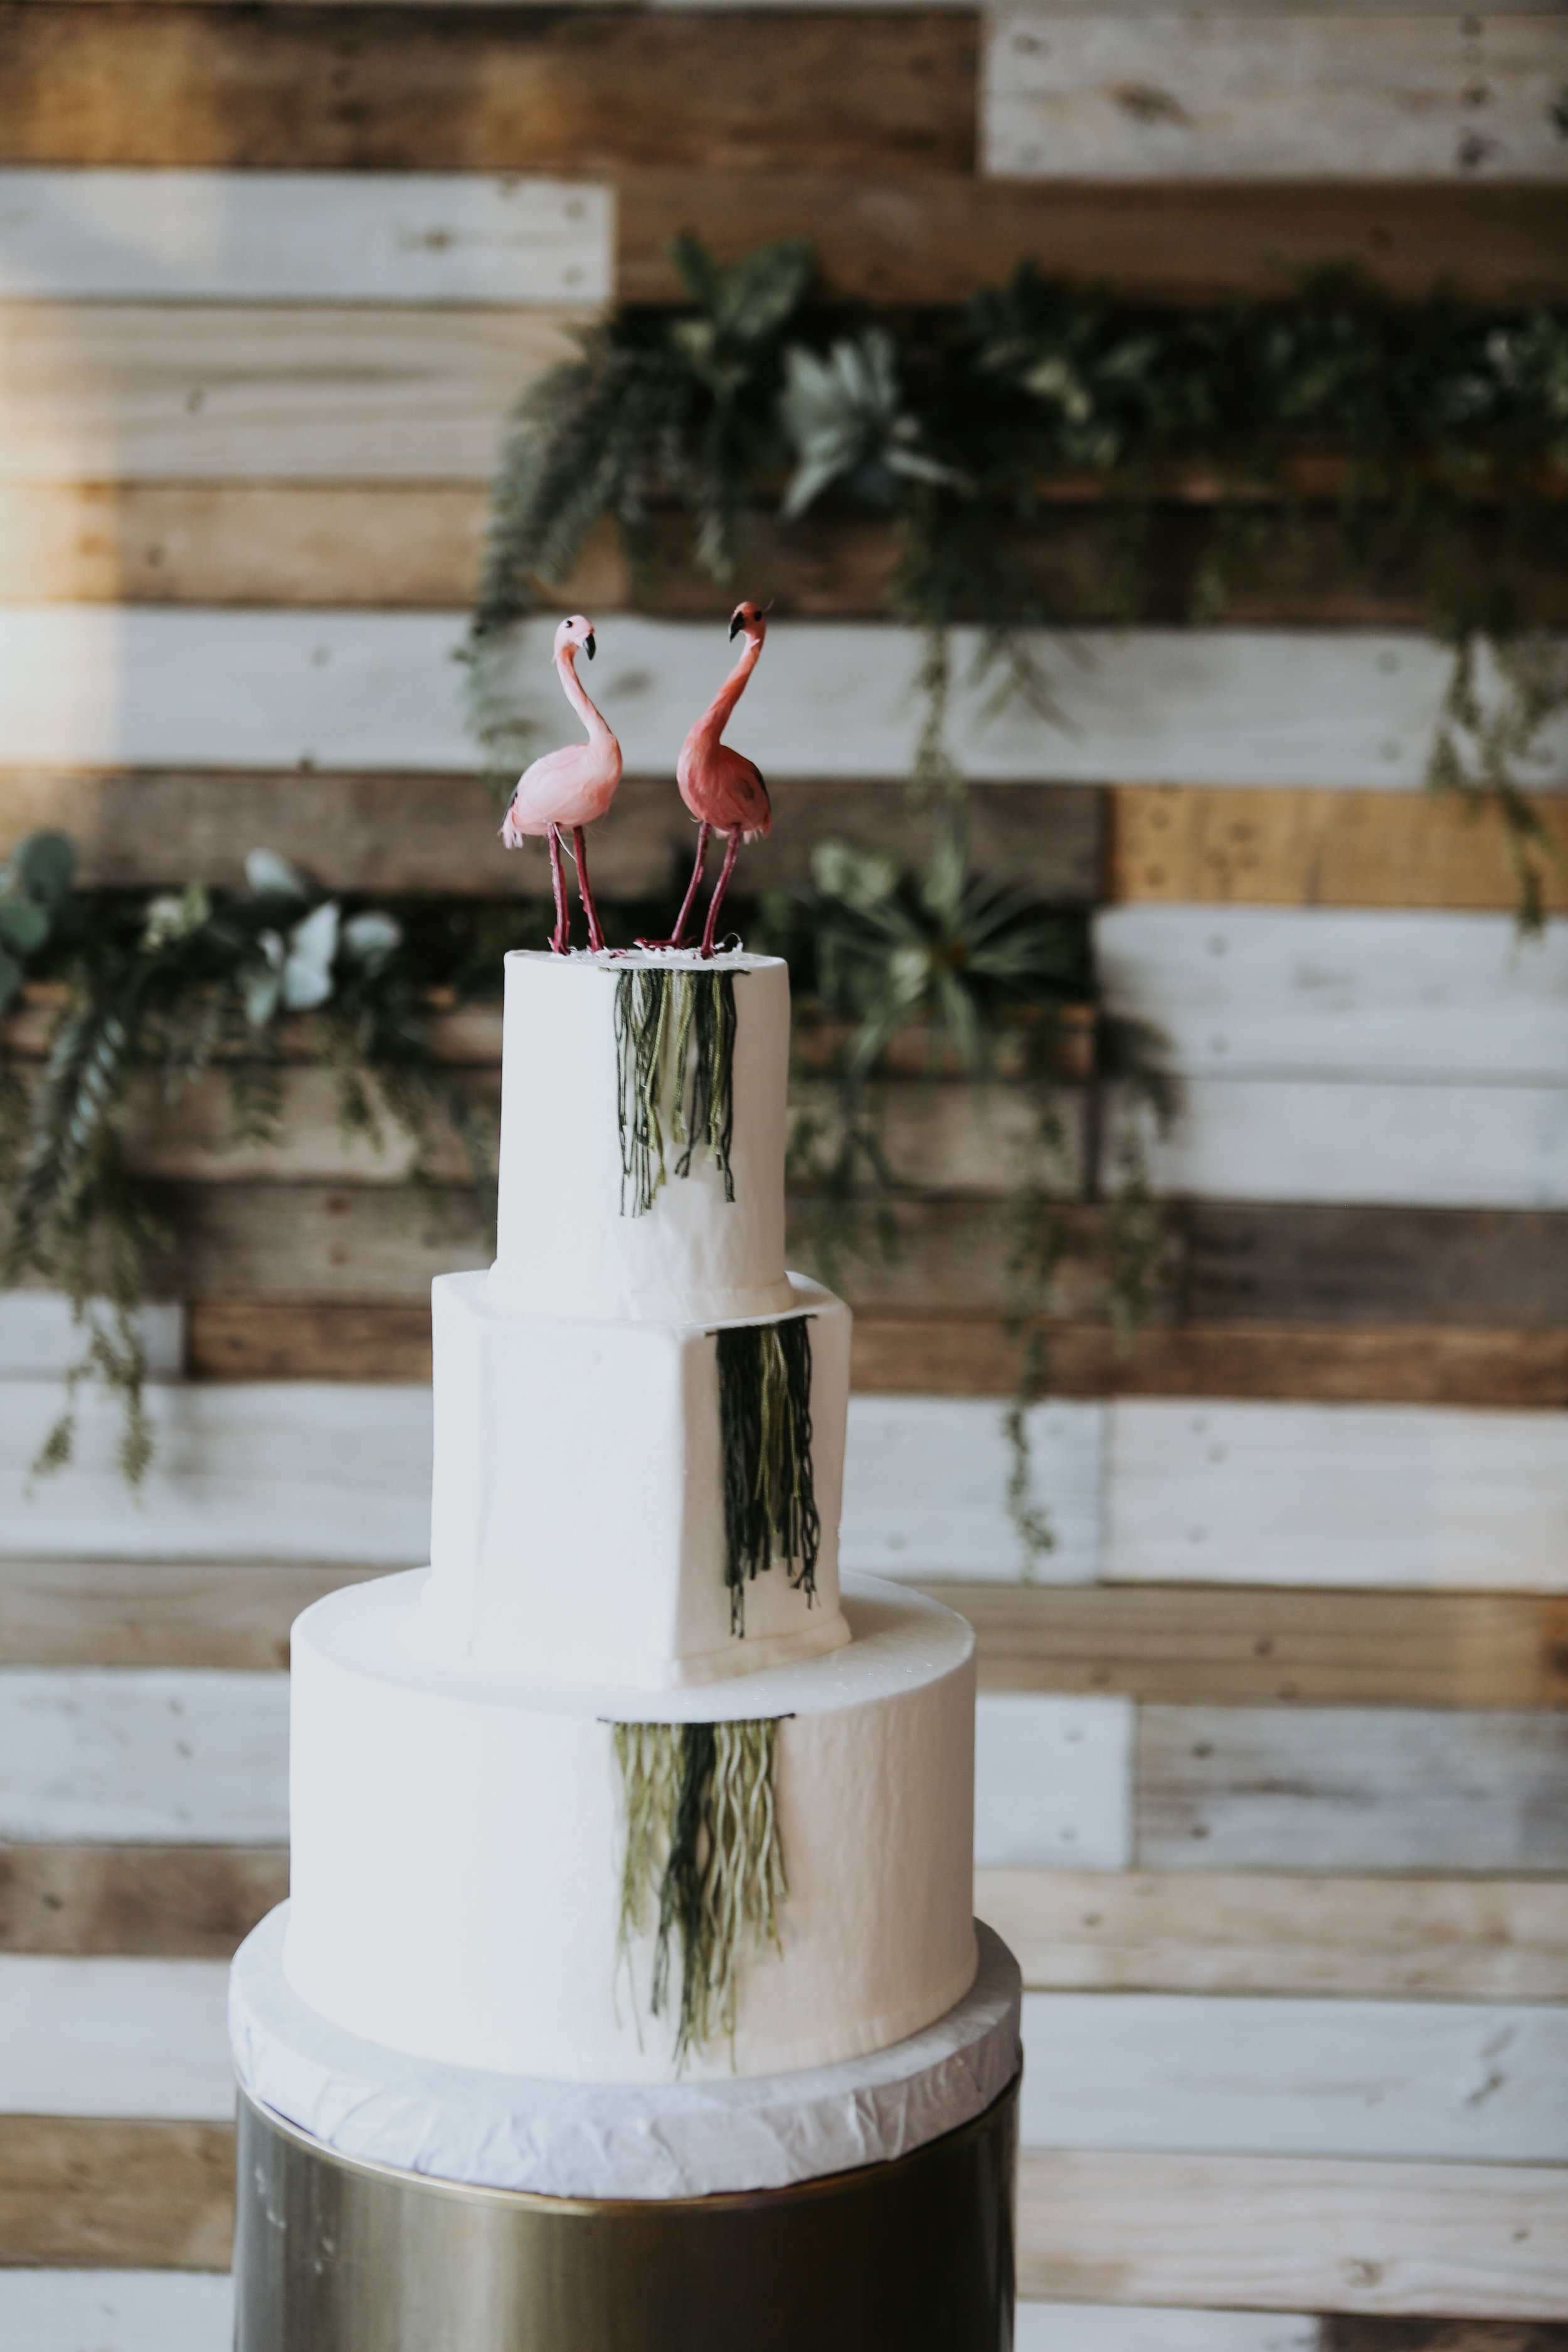 Flamingo Topped Wedding Cake - Natalee and Felicia - Unions With Celia Wedding Coordinator